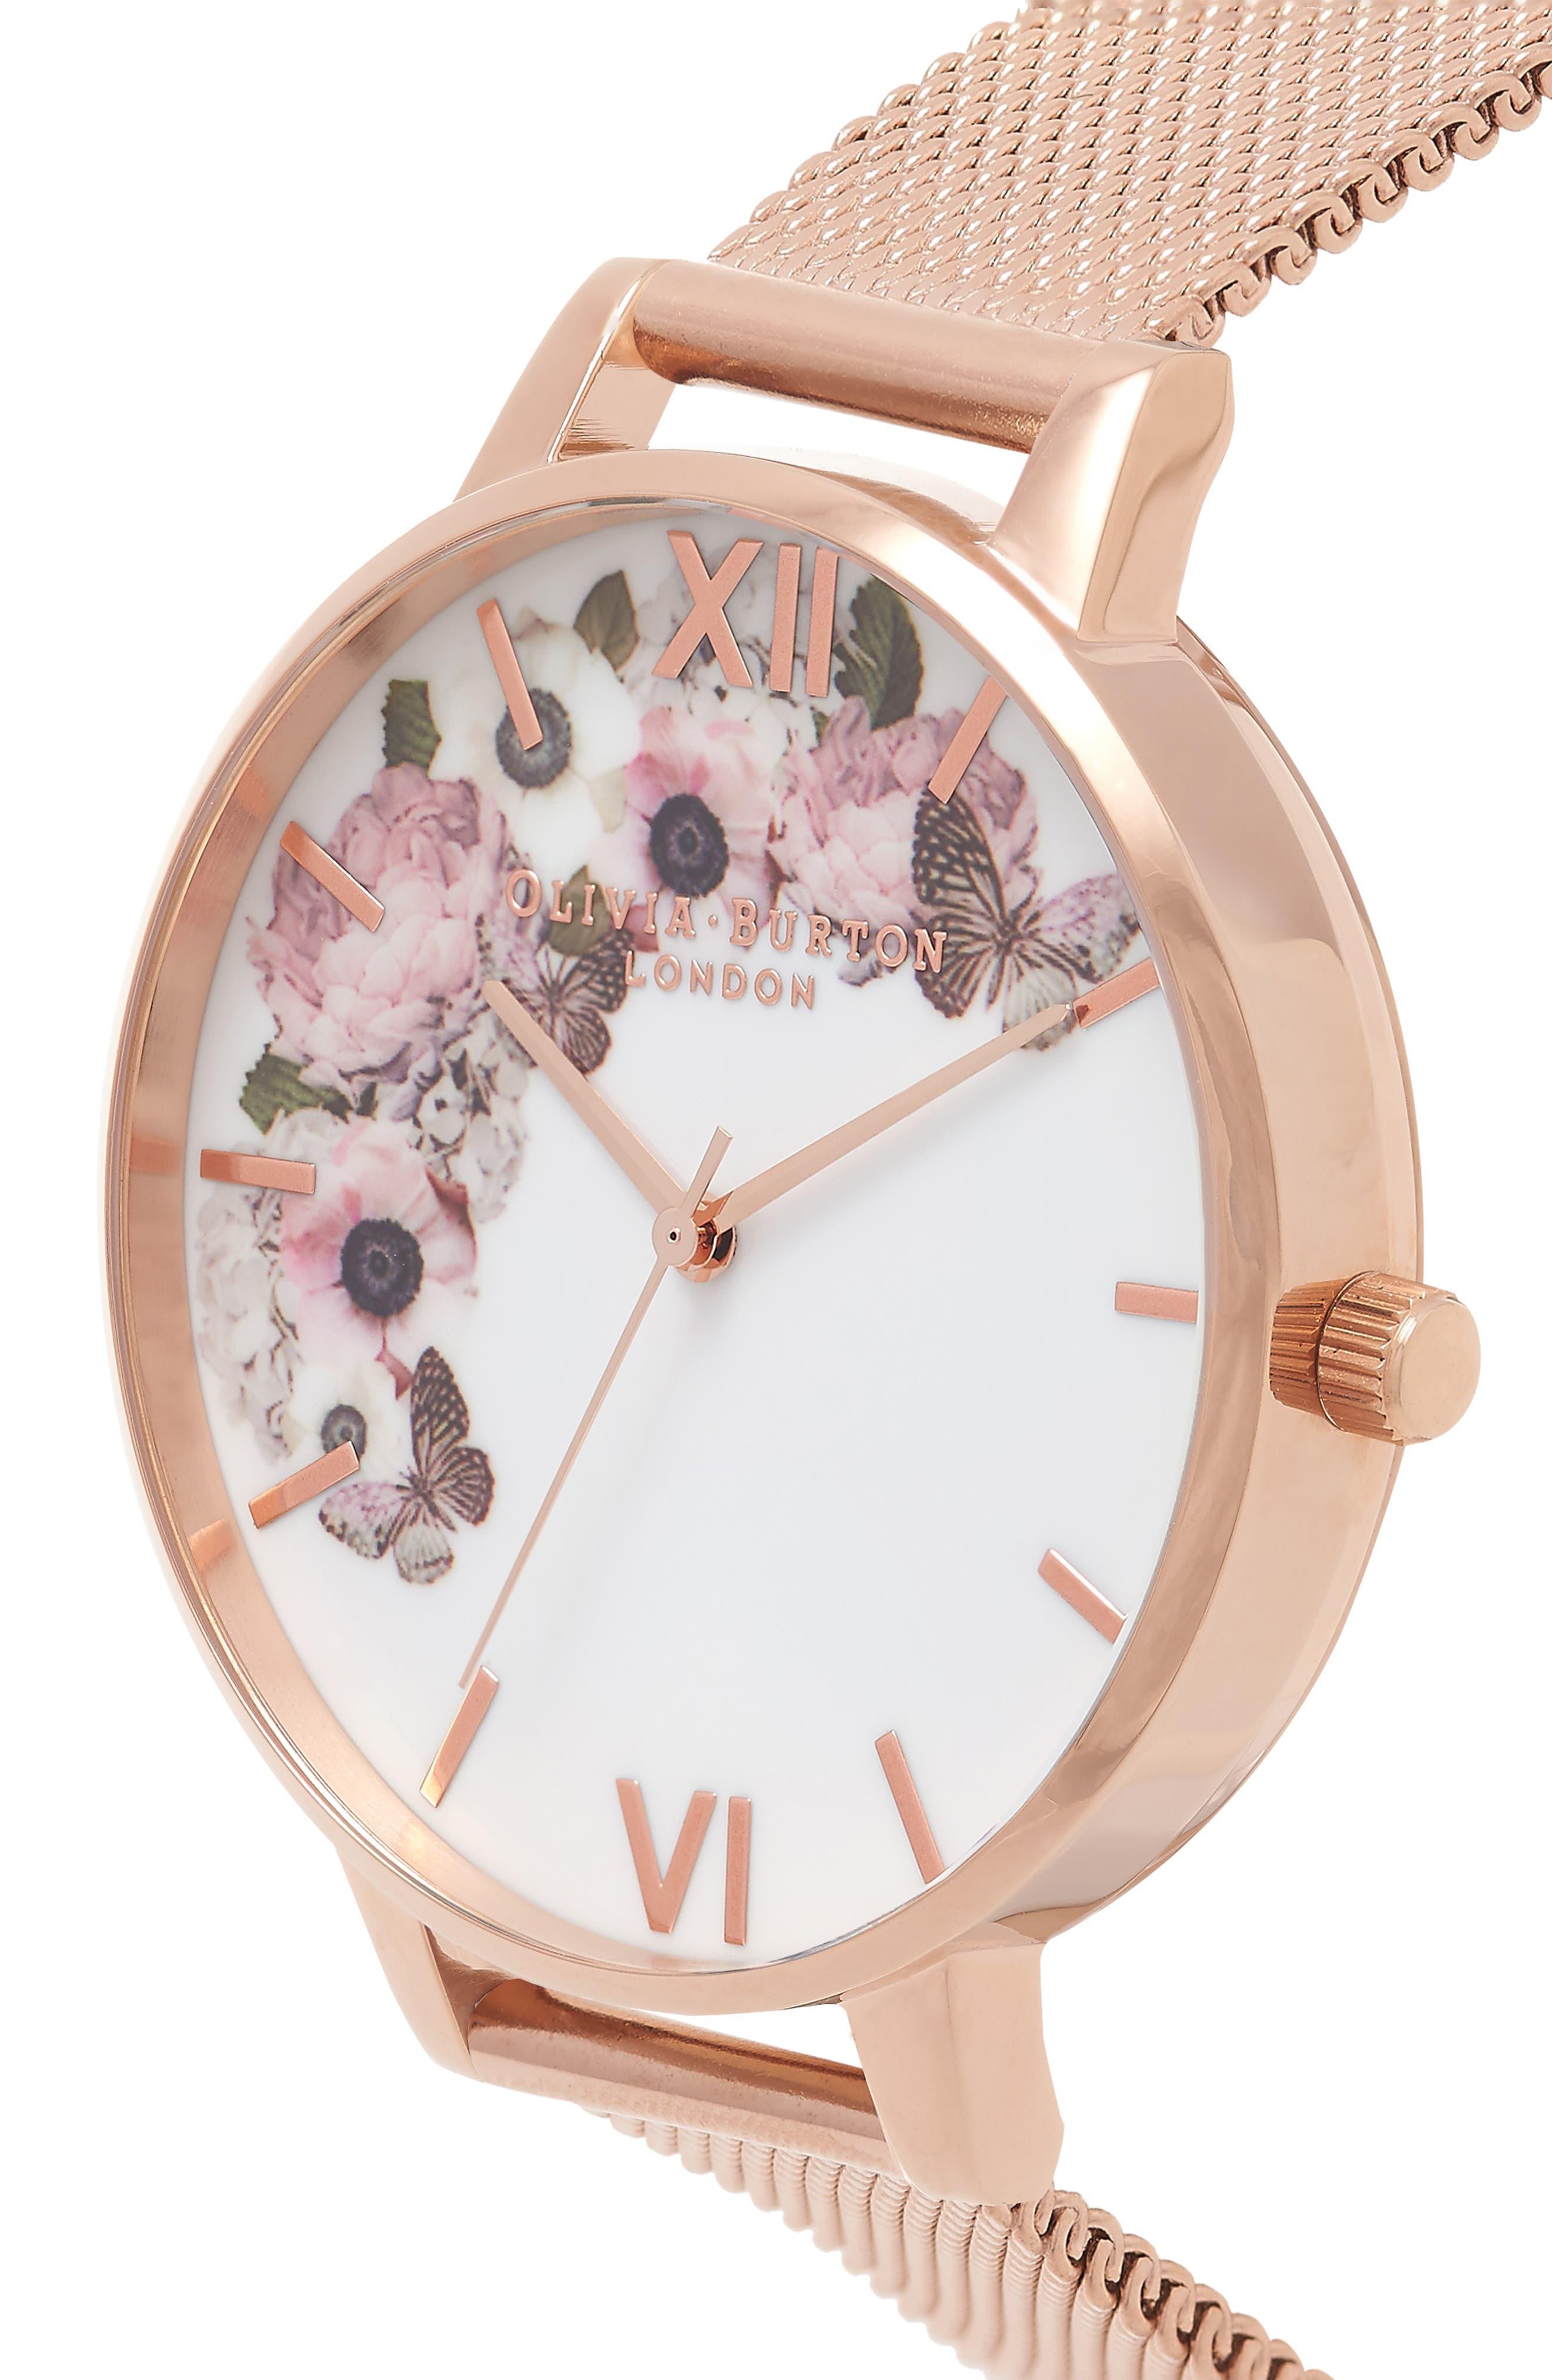 OLIVIA BURTON, Signature Florals Mesh Bracelet Watch, 38mm, Alternate thumbnail 4, color, ROSE GOLD/ ROSE GOLD/ WHITE